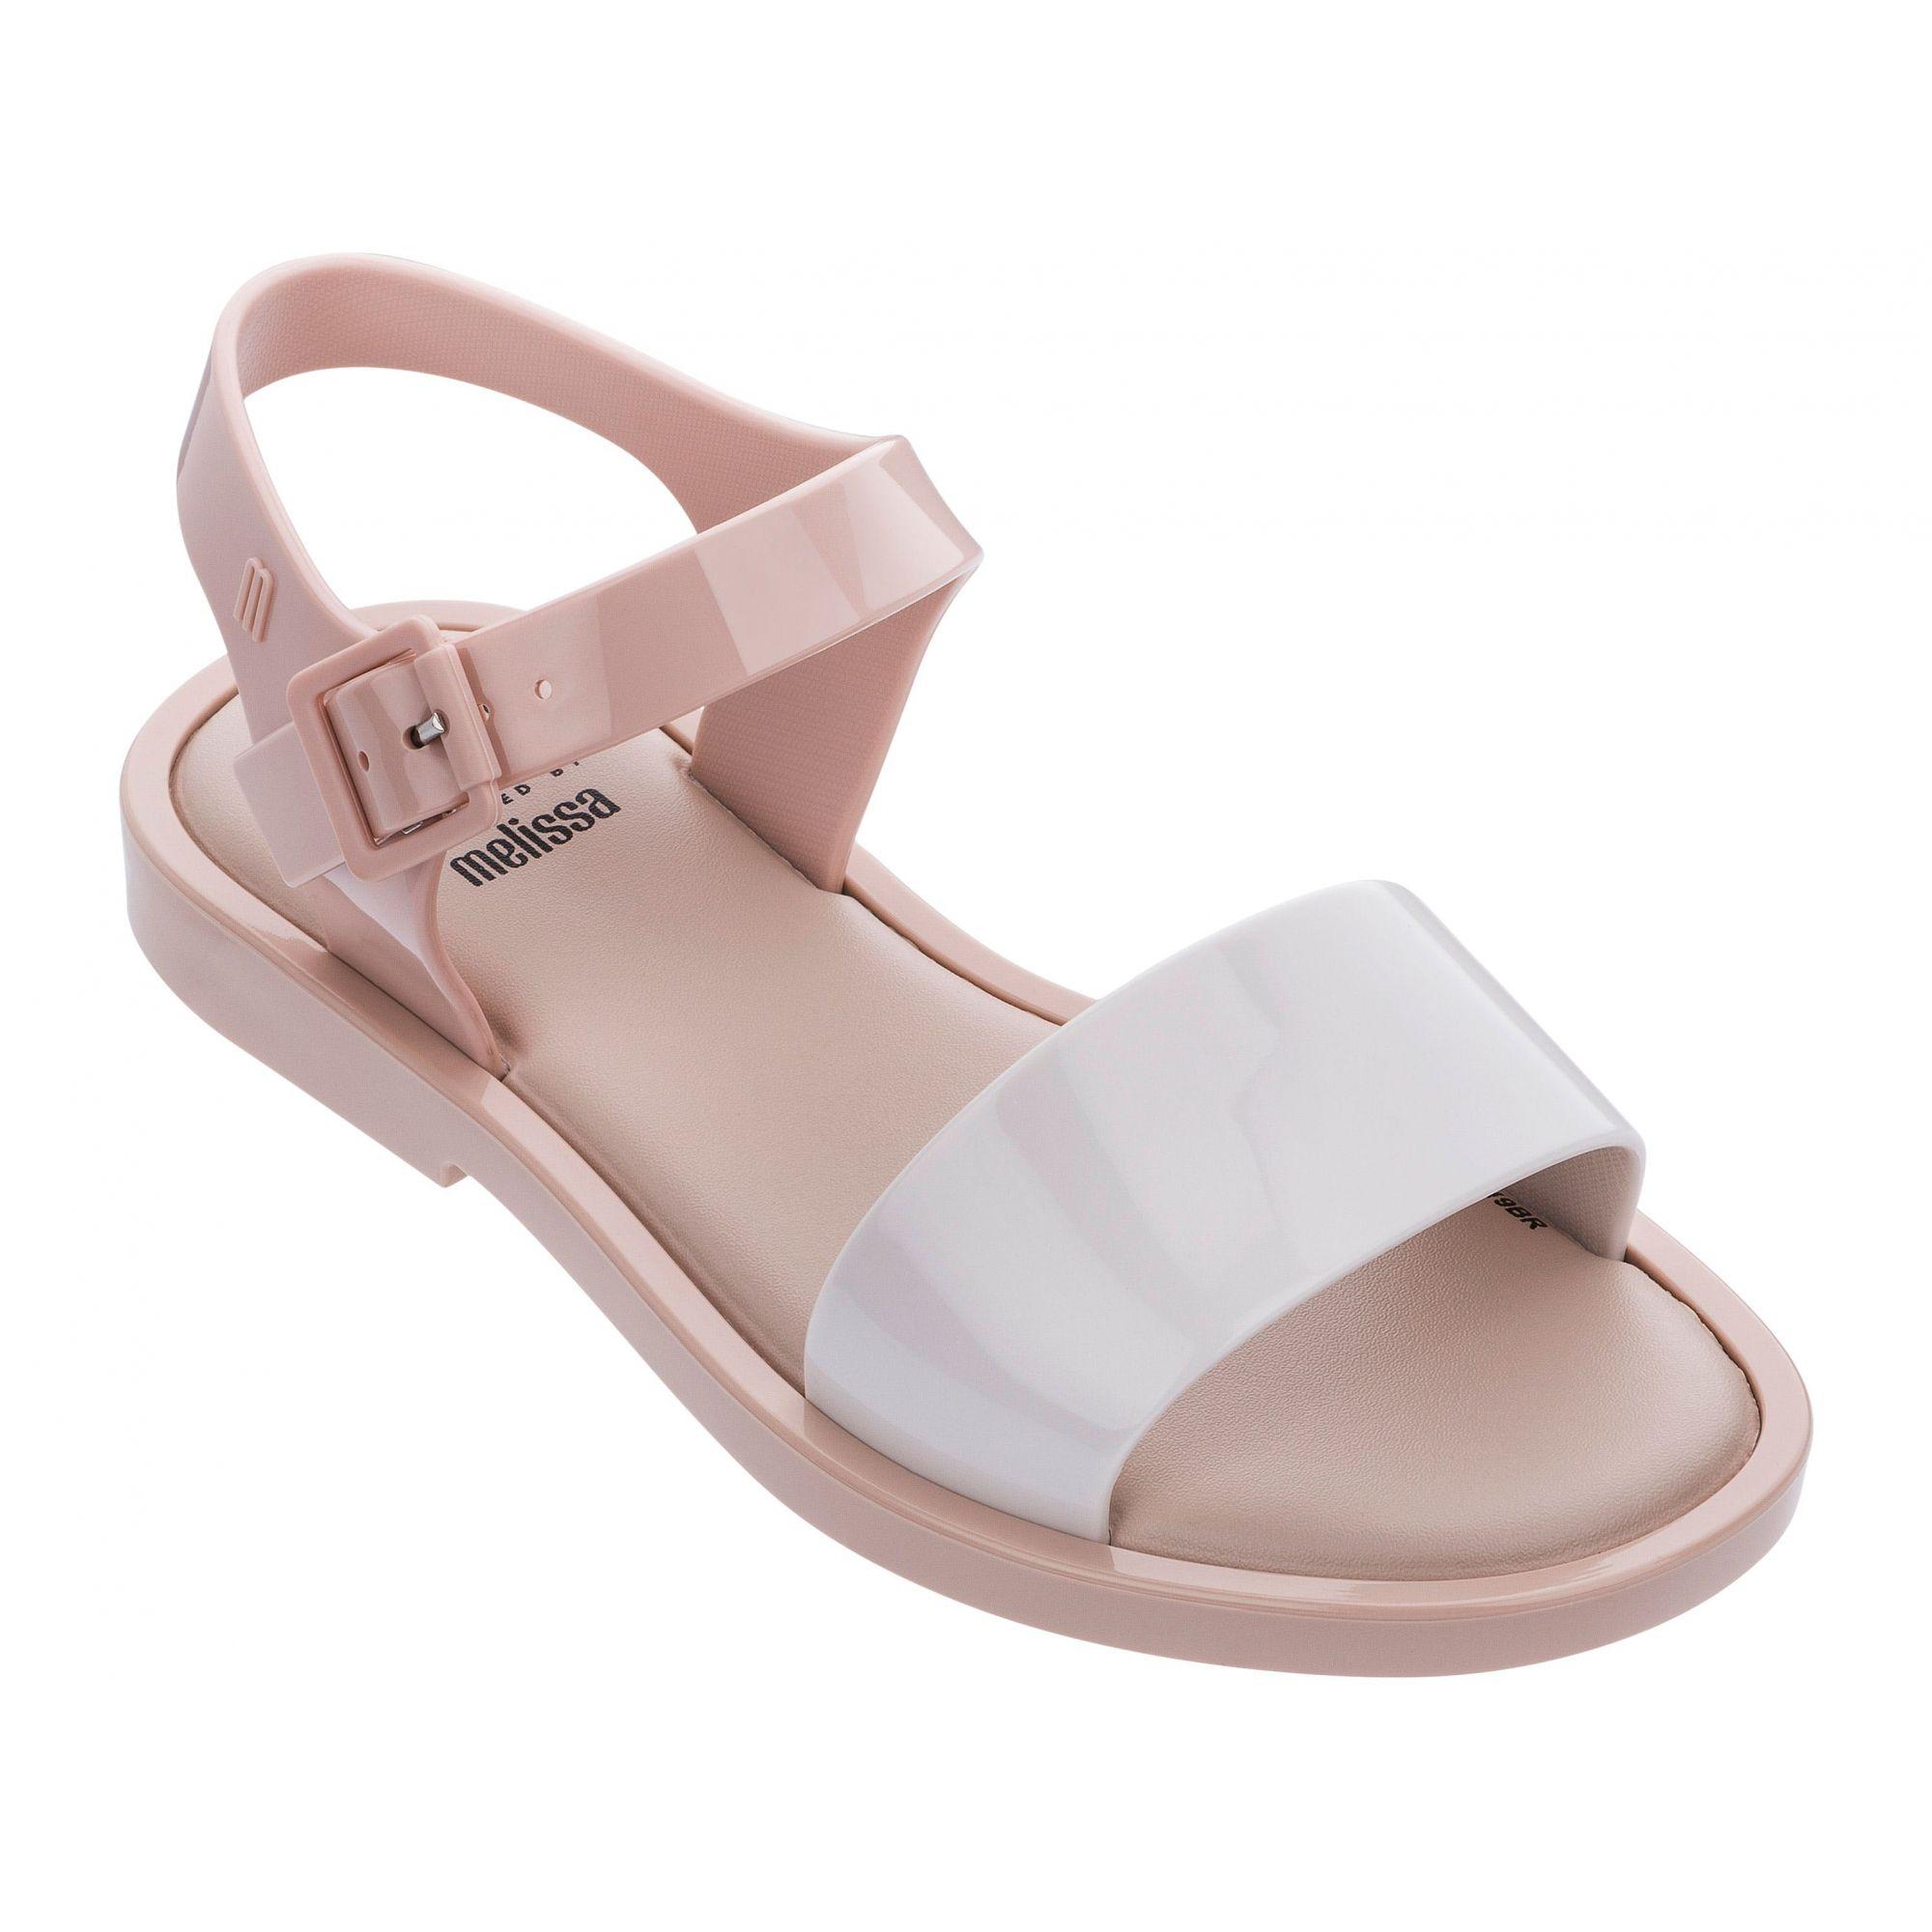 Melissa Mel Mar Sandal Bege Branco Rosa